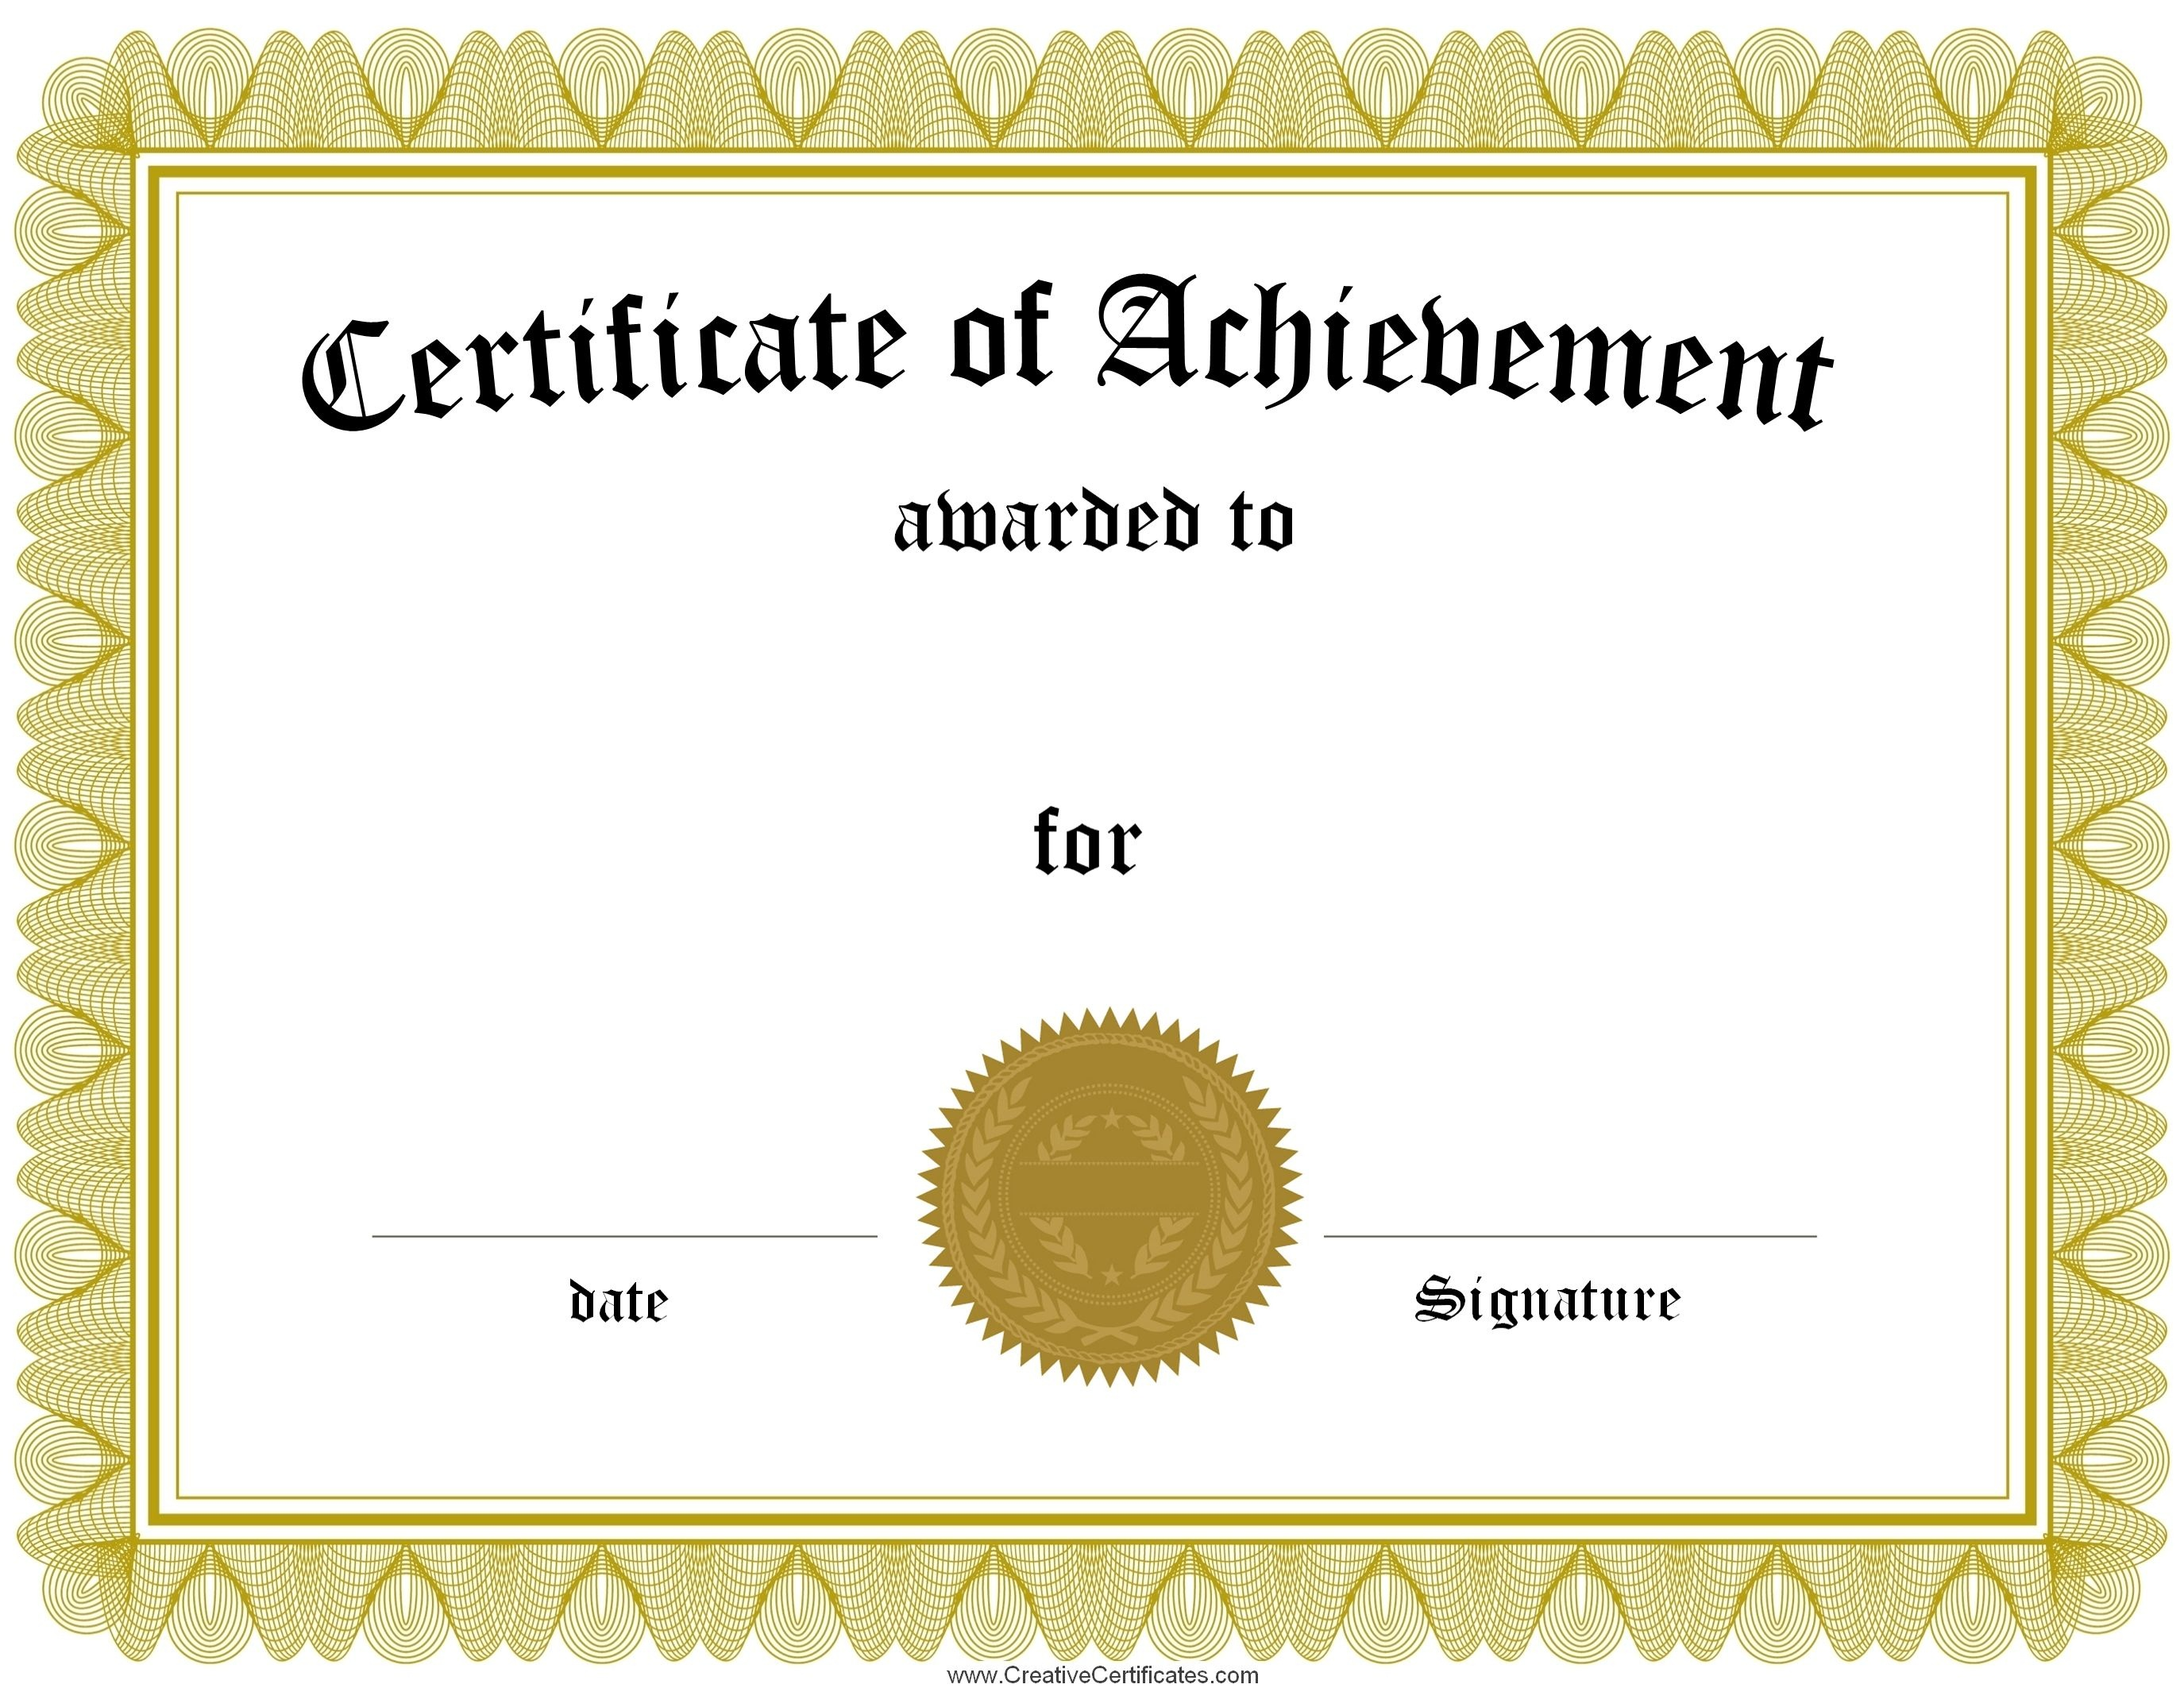 Printable Certificate Templates - Tutlin.psstech.co - Free Printable Certificates